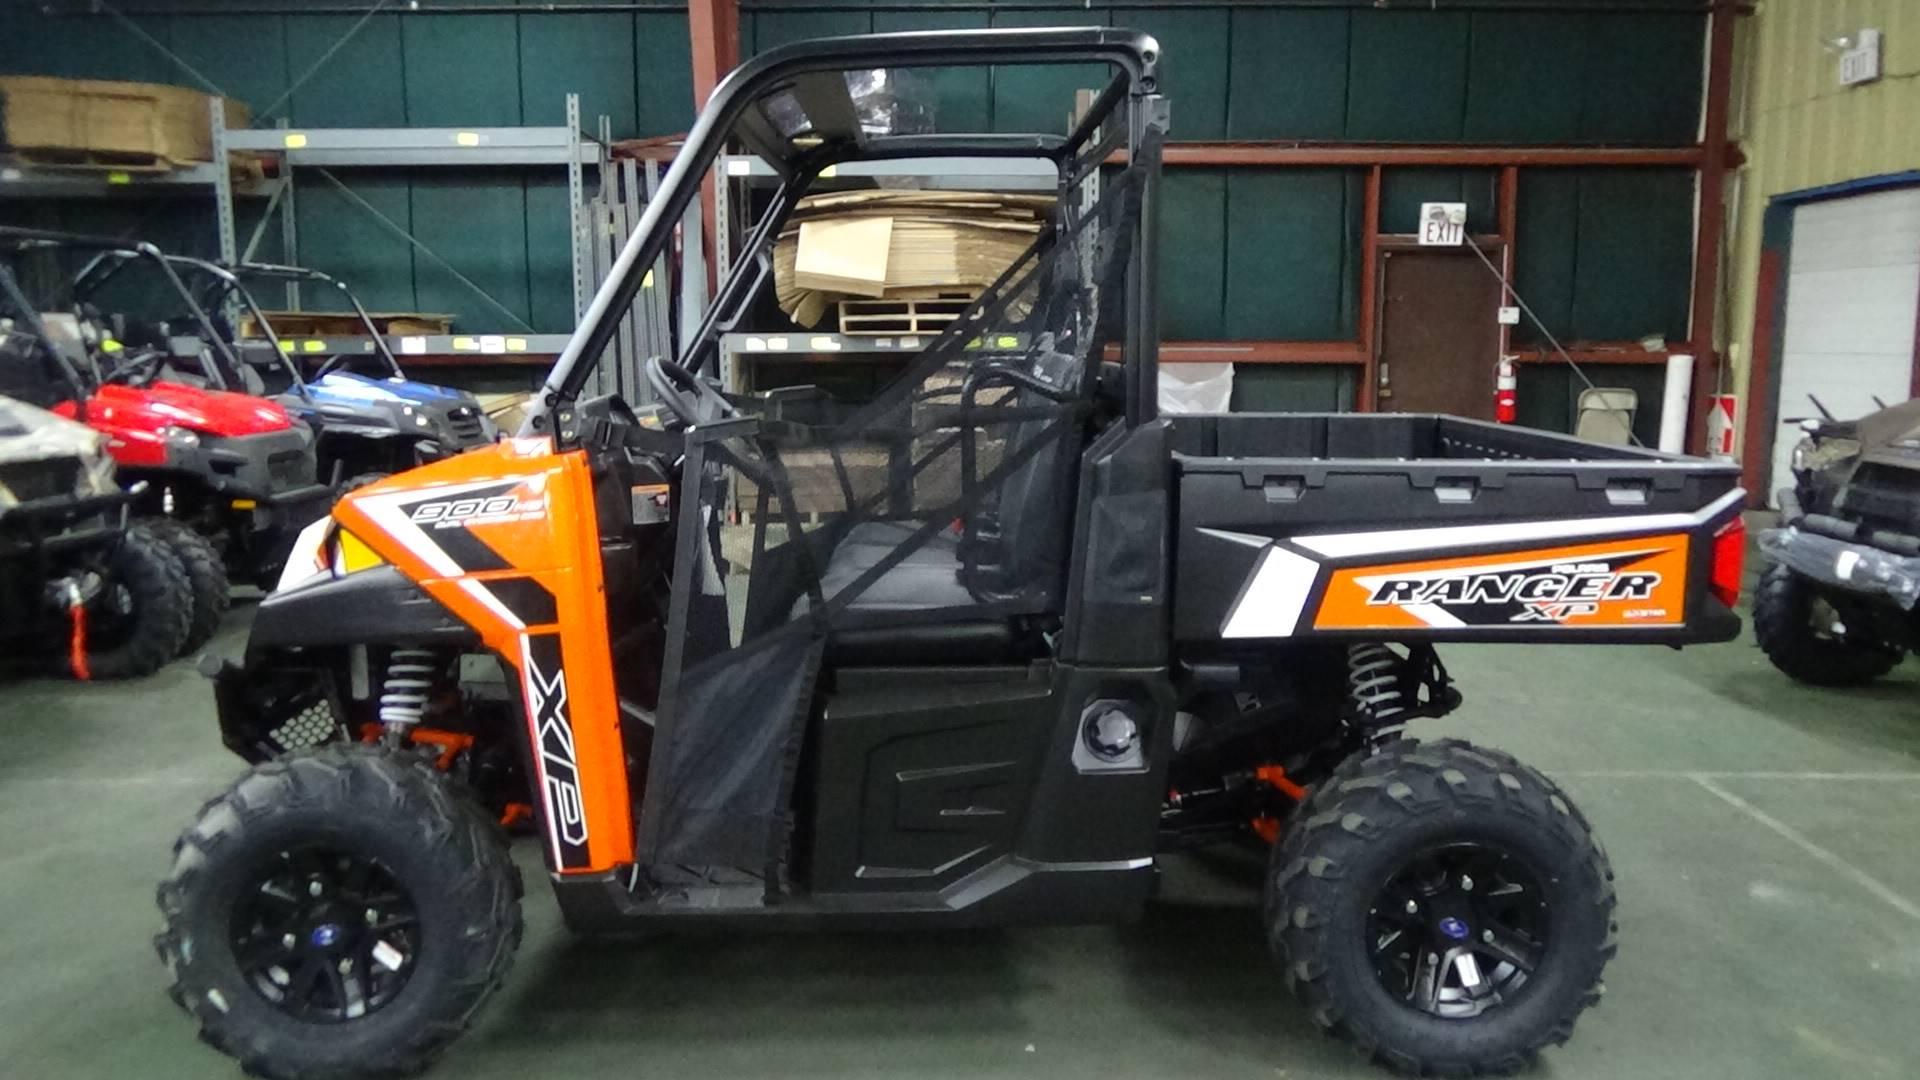 2019 Polaris Ranger XP 900 EPS for sale 4227